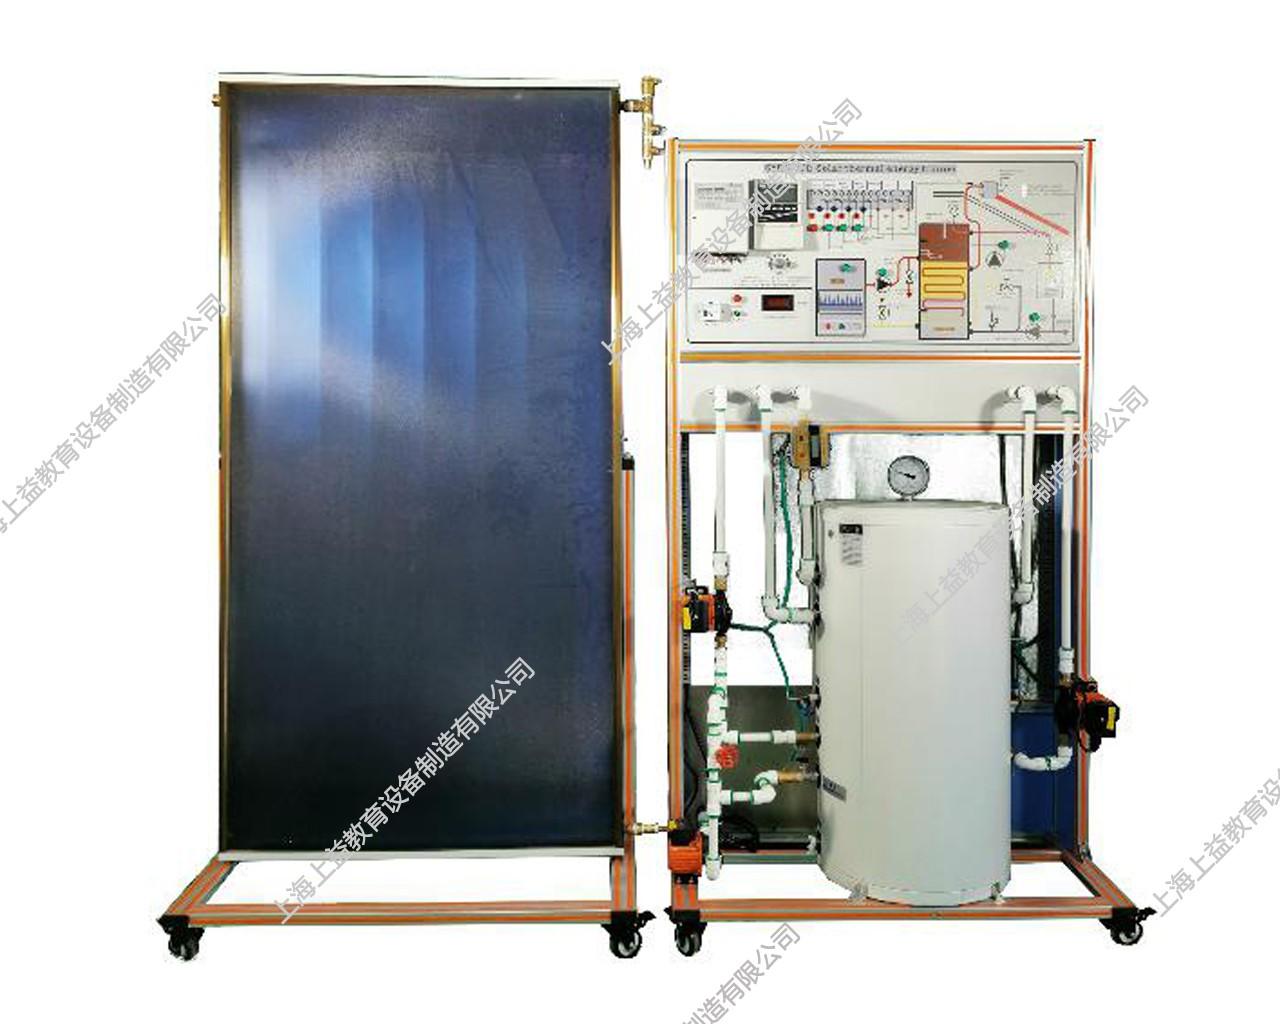 SYRN-02B太阳能热能培训器